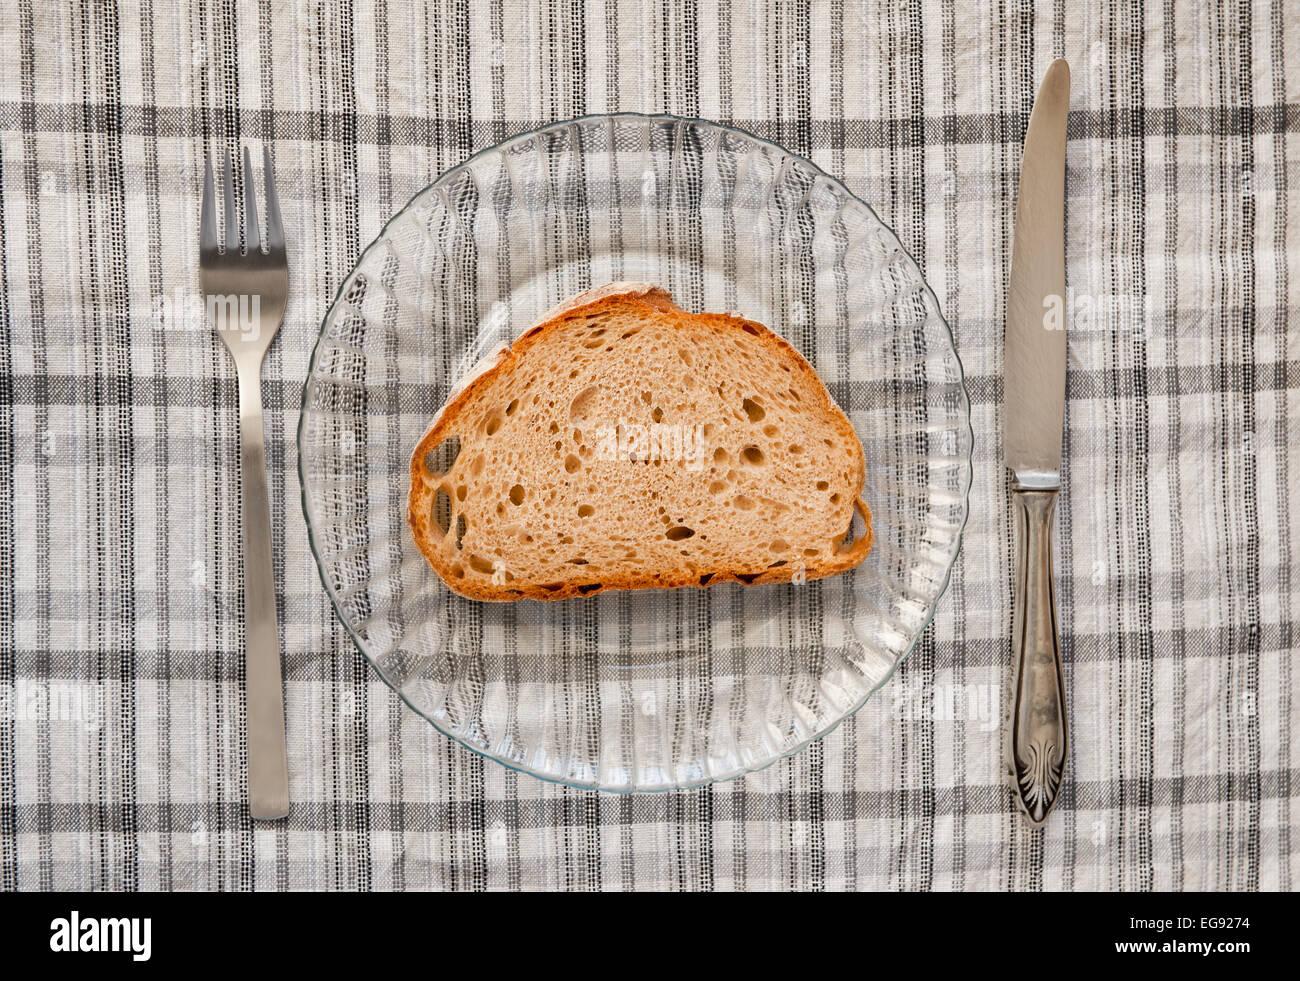 Bread slice poor meal - Stock Image